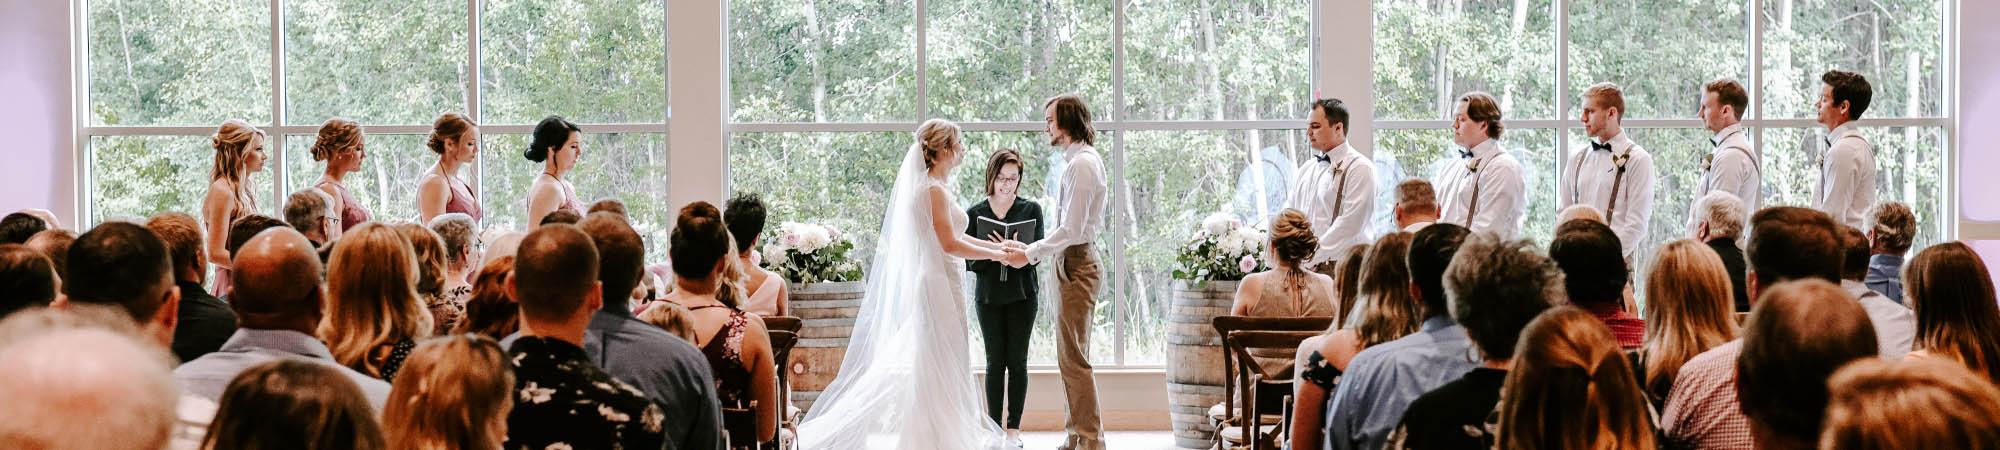 Braham Center Events and Wedding Reception Reviews.